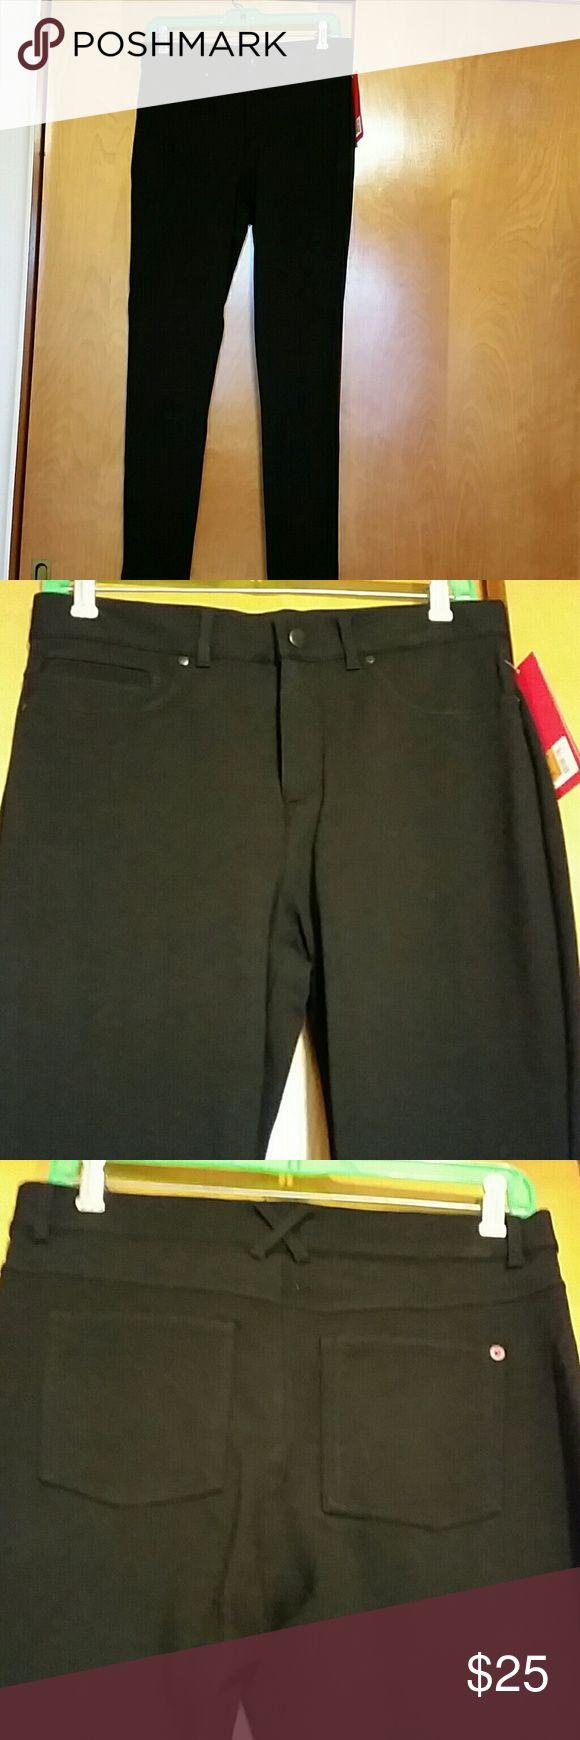 Spanx The Slim-X Pointe Super Skinny Pant Black Spanx The Slim-X Pointe Super Skinny Pant, size 29, NWT SPANX Pants Skinny